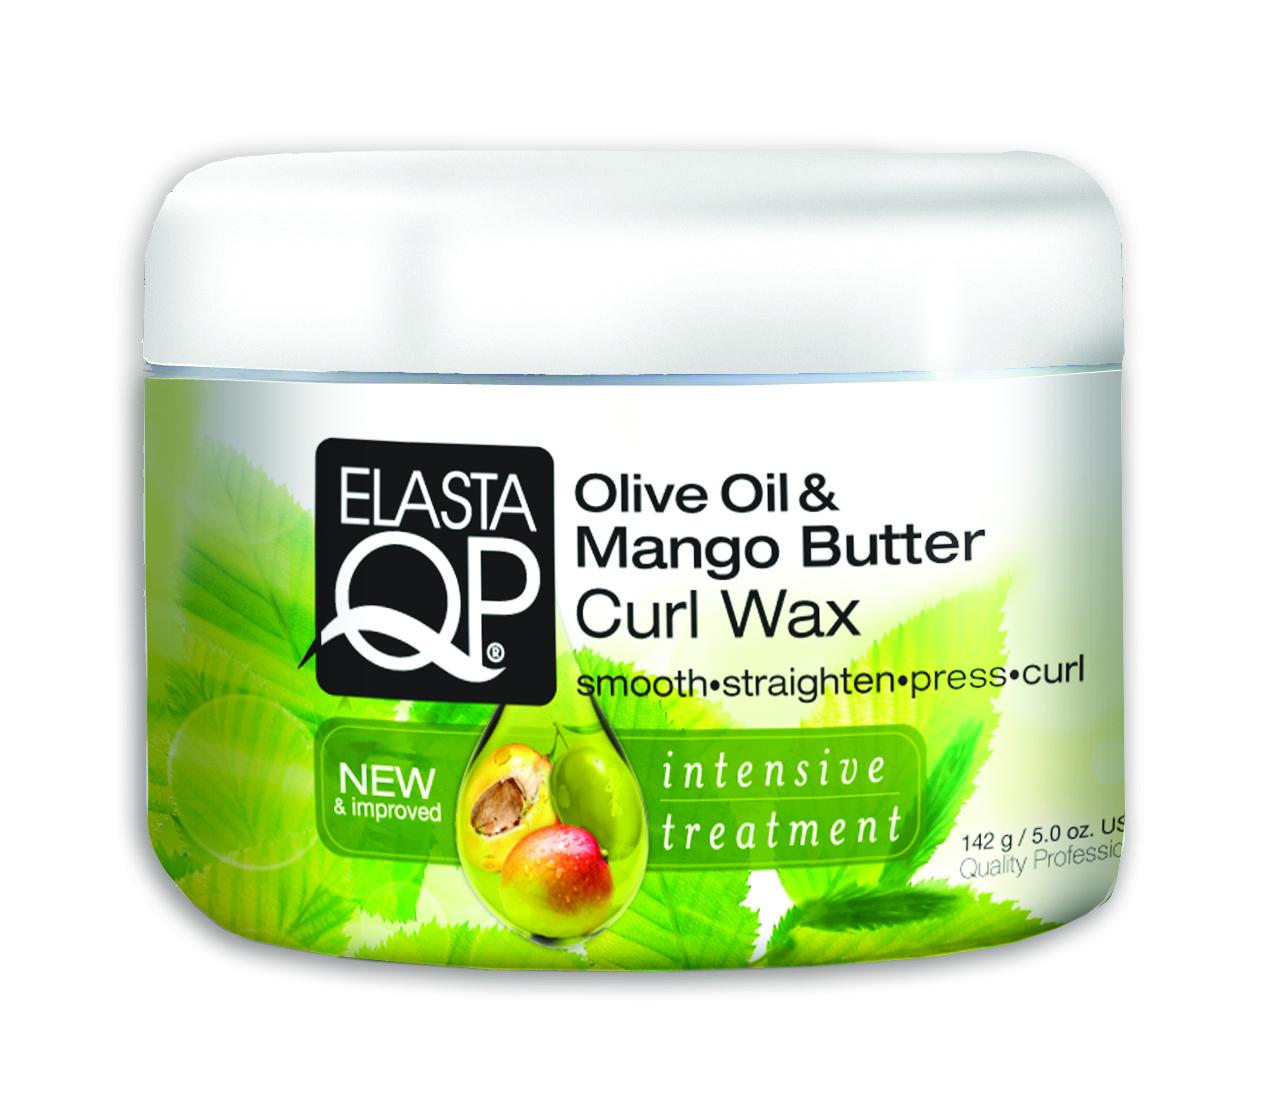 Olive Oil & Mango Butter Curl Wax